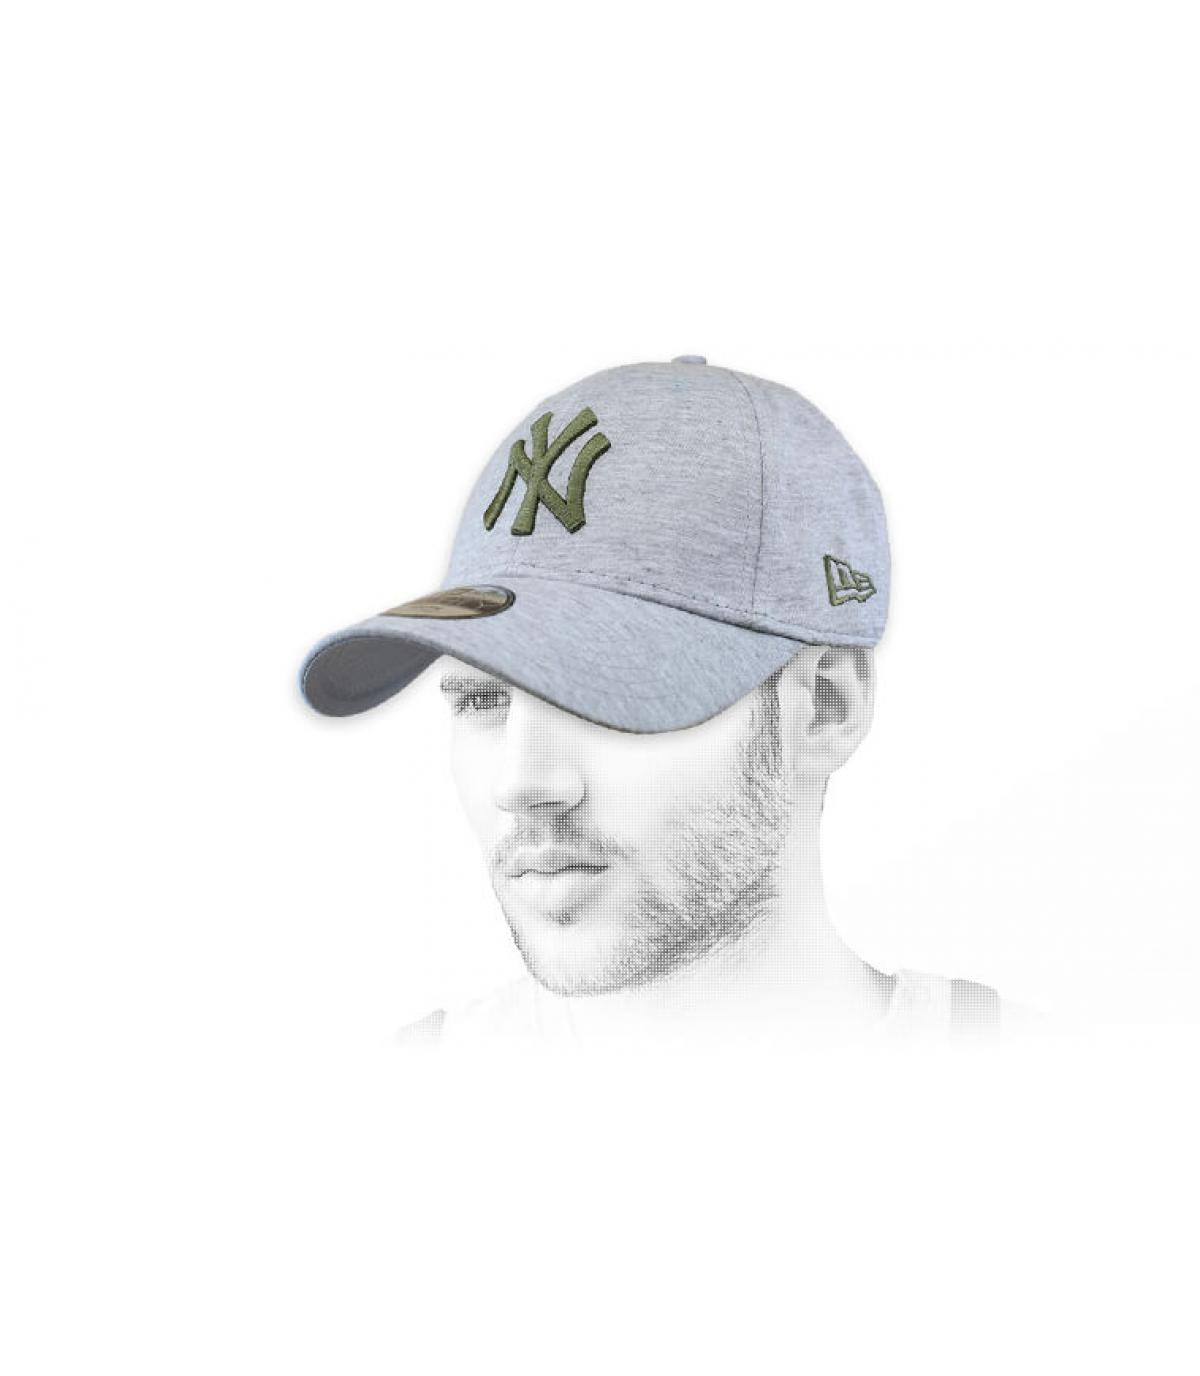 Cap NY grau grün